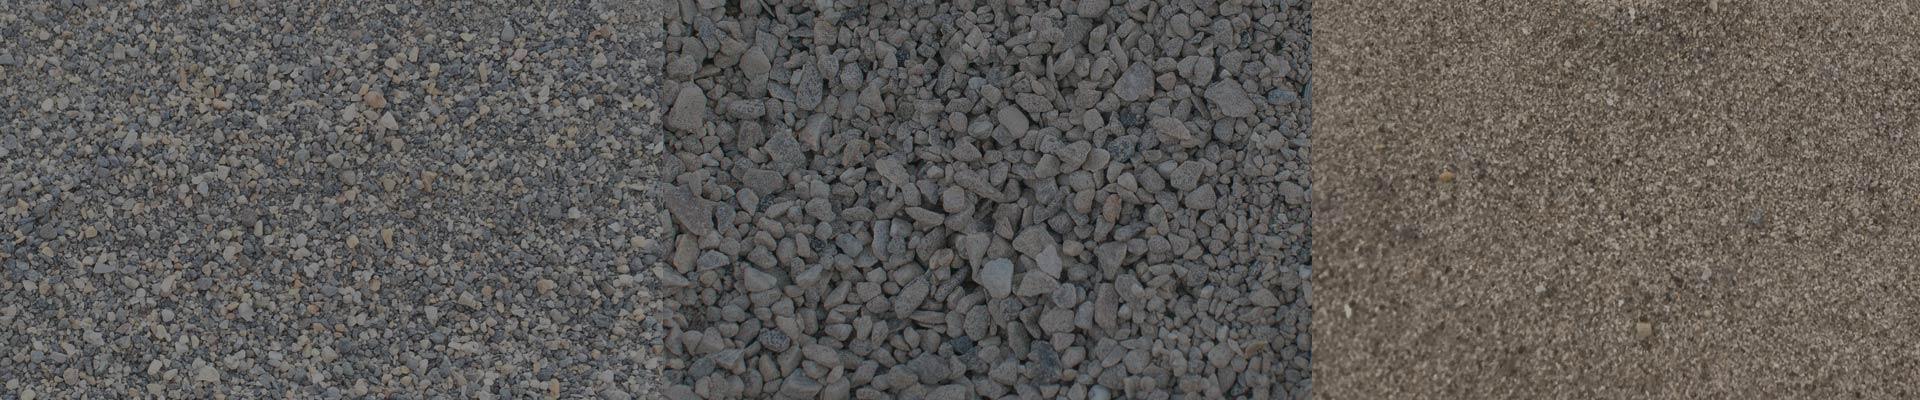 Sand banner image